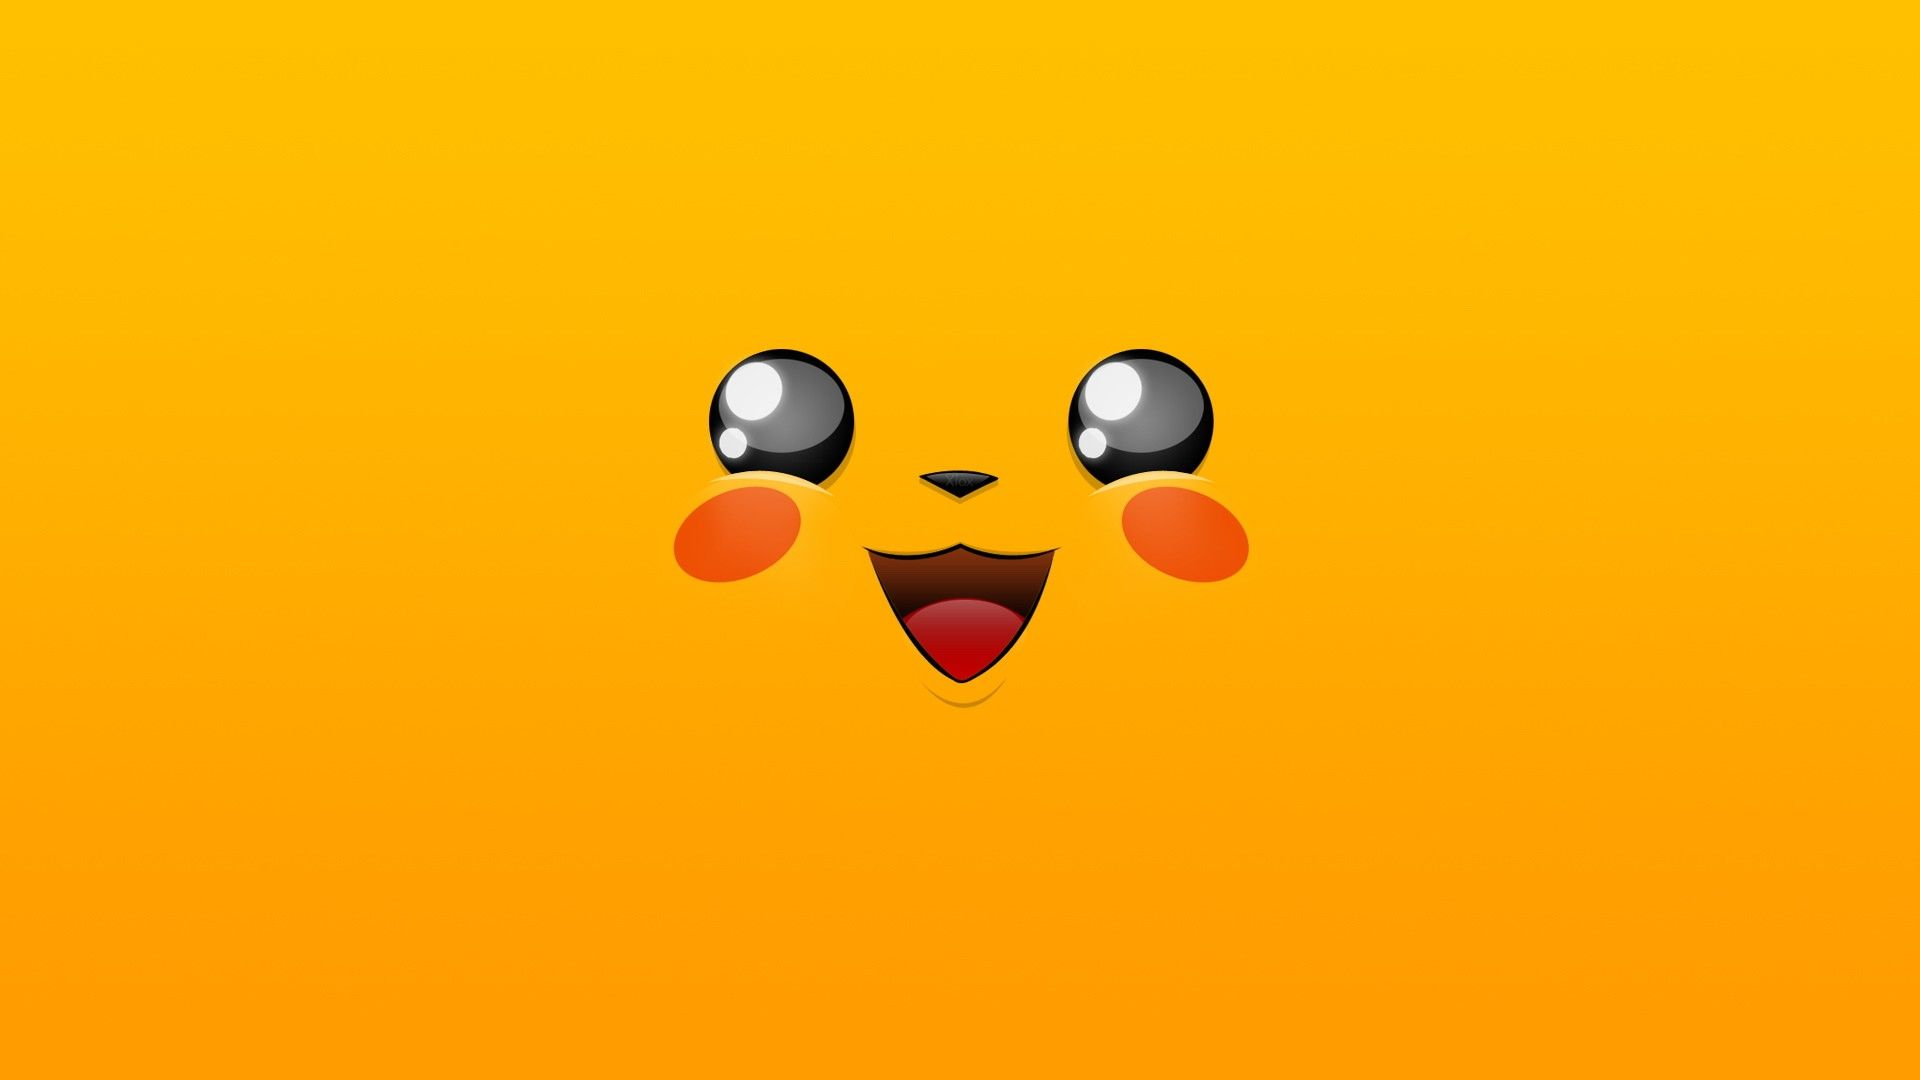 Download Pikachu Wallpaper 4353 1920x1080 px High Resolution ...